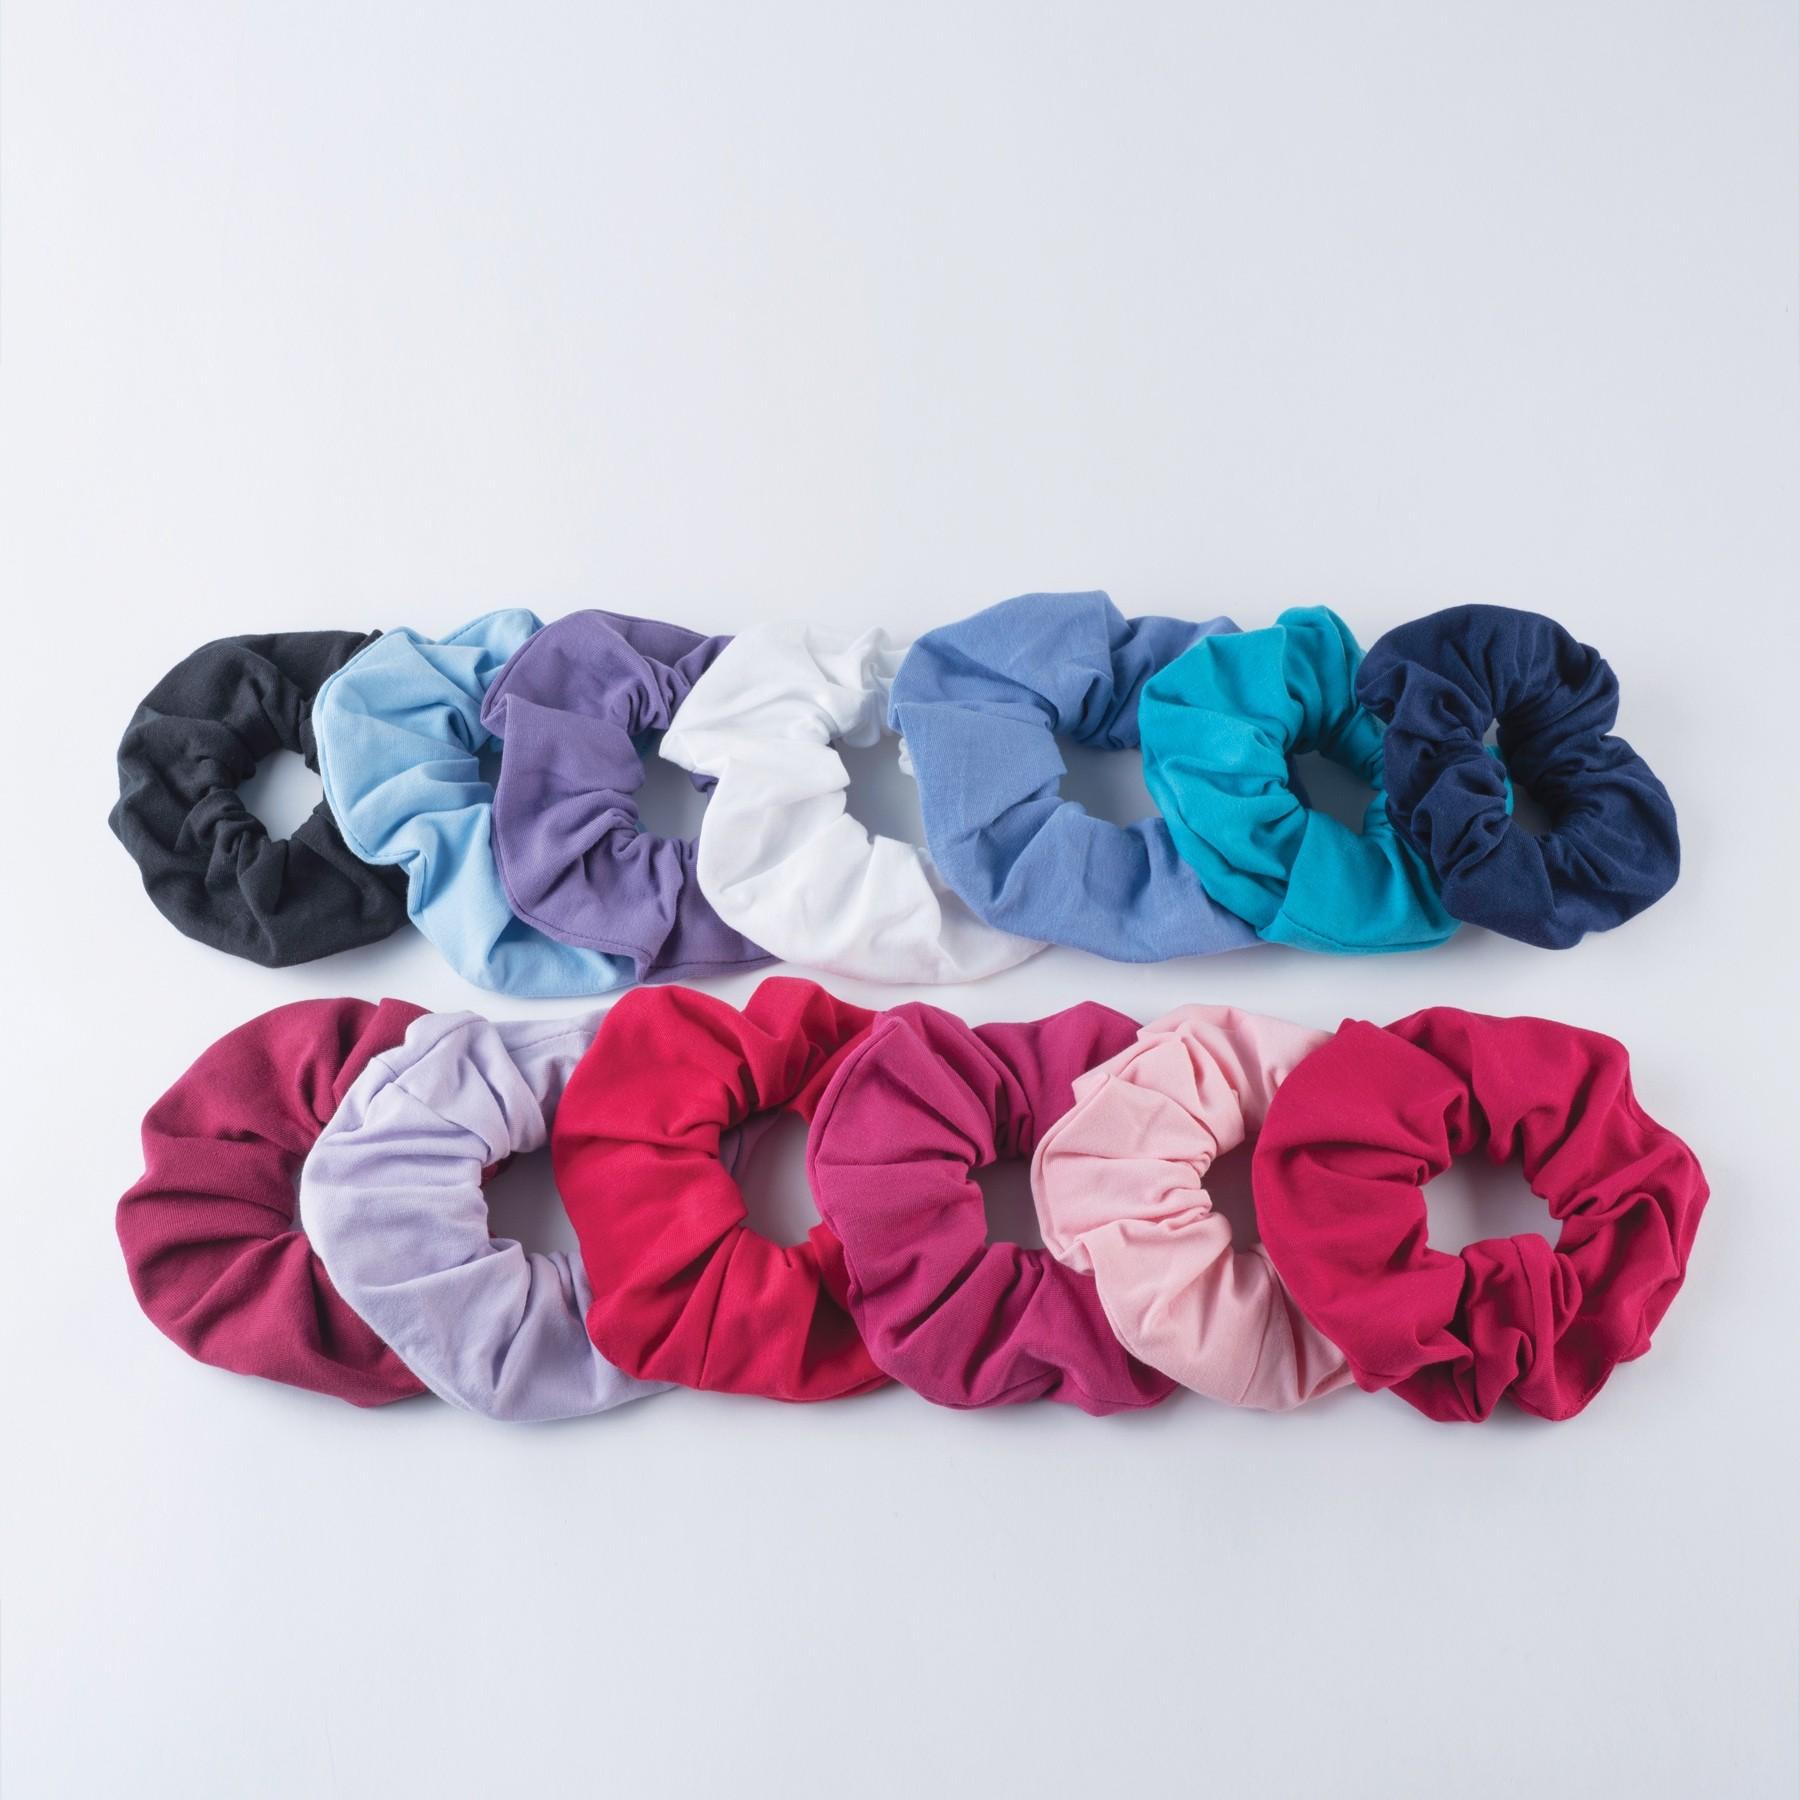 1st Position Single Scrunchie (Cotton/Elastane) Plum